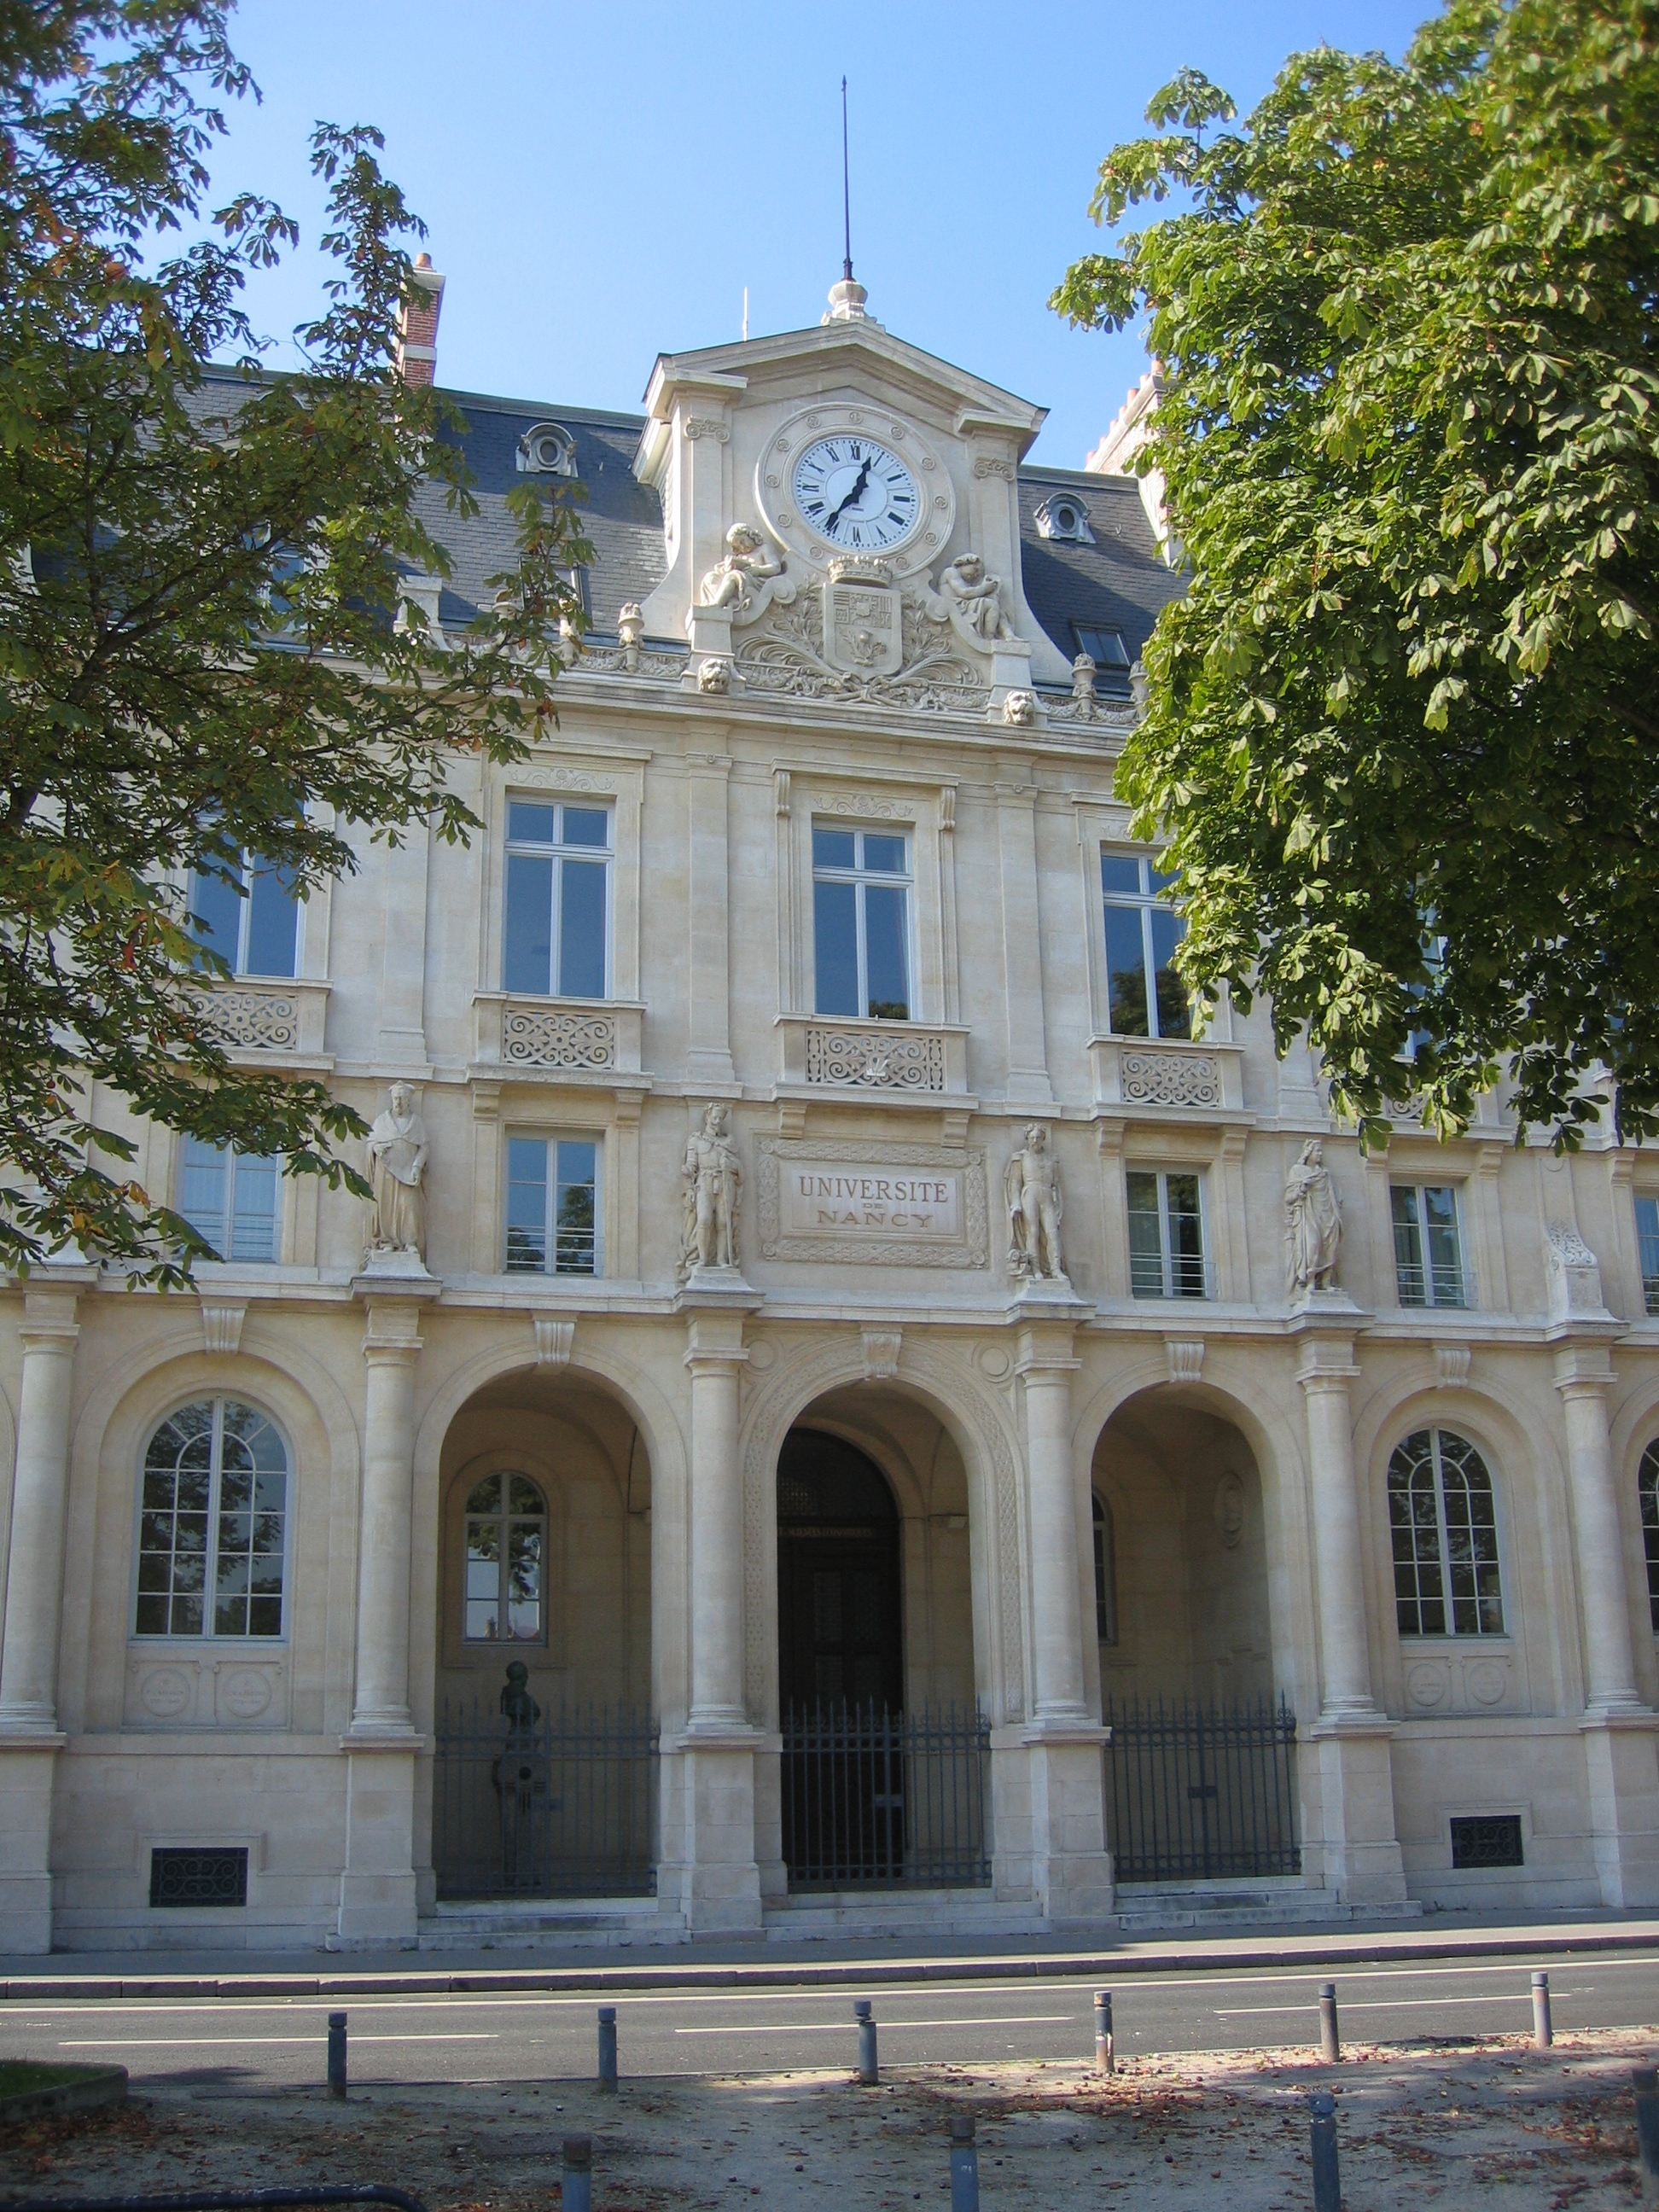 Universit de lorraine wikiwand for Ancienne maison des gardes lourmarin france